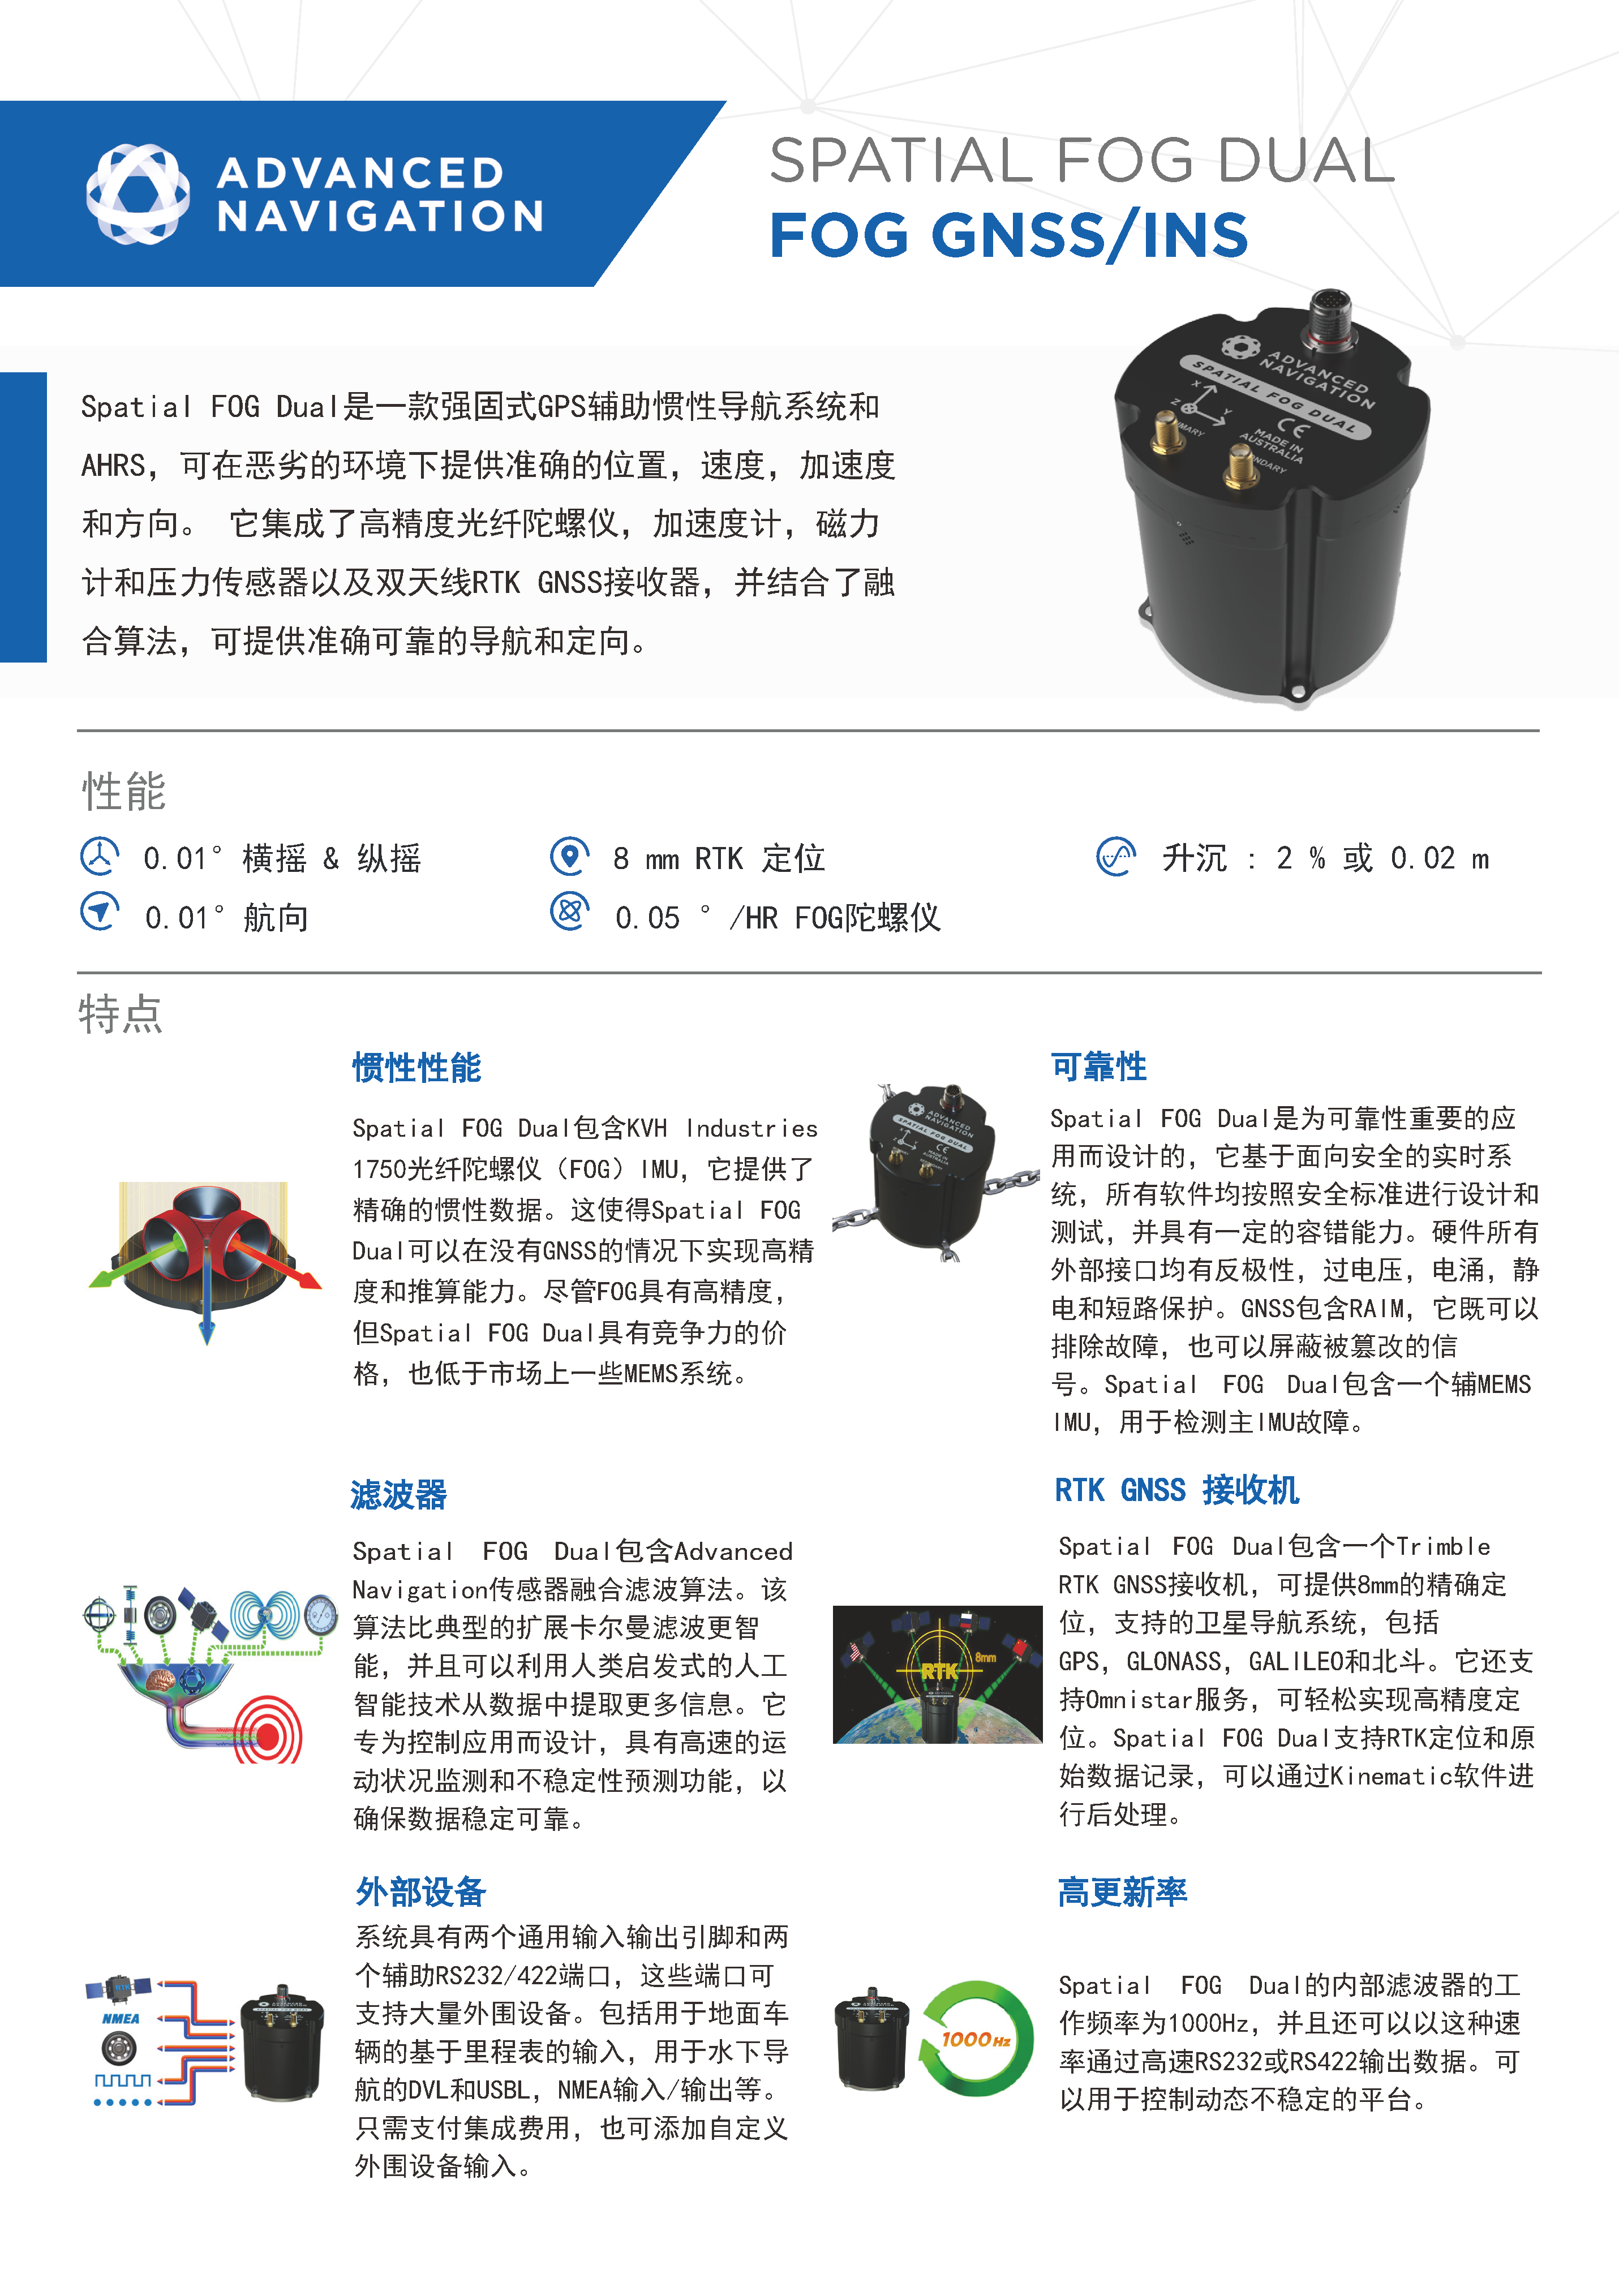 Spatial FOG Dual GNSS/INS惯性导航系统